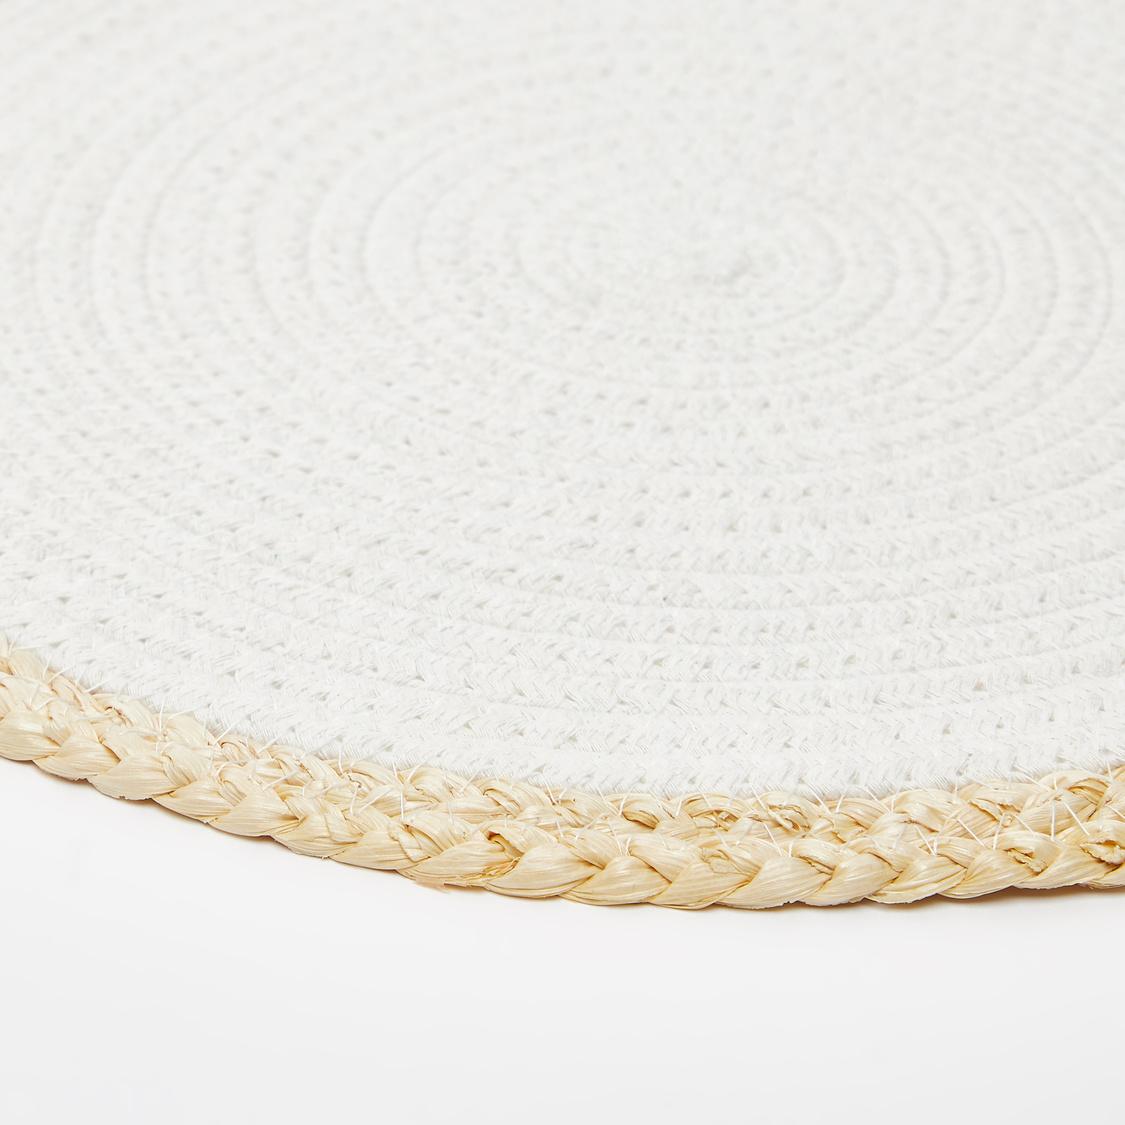 Textured Round Placemat - 38 cms